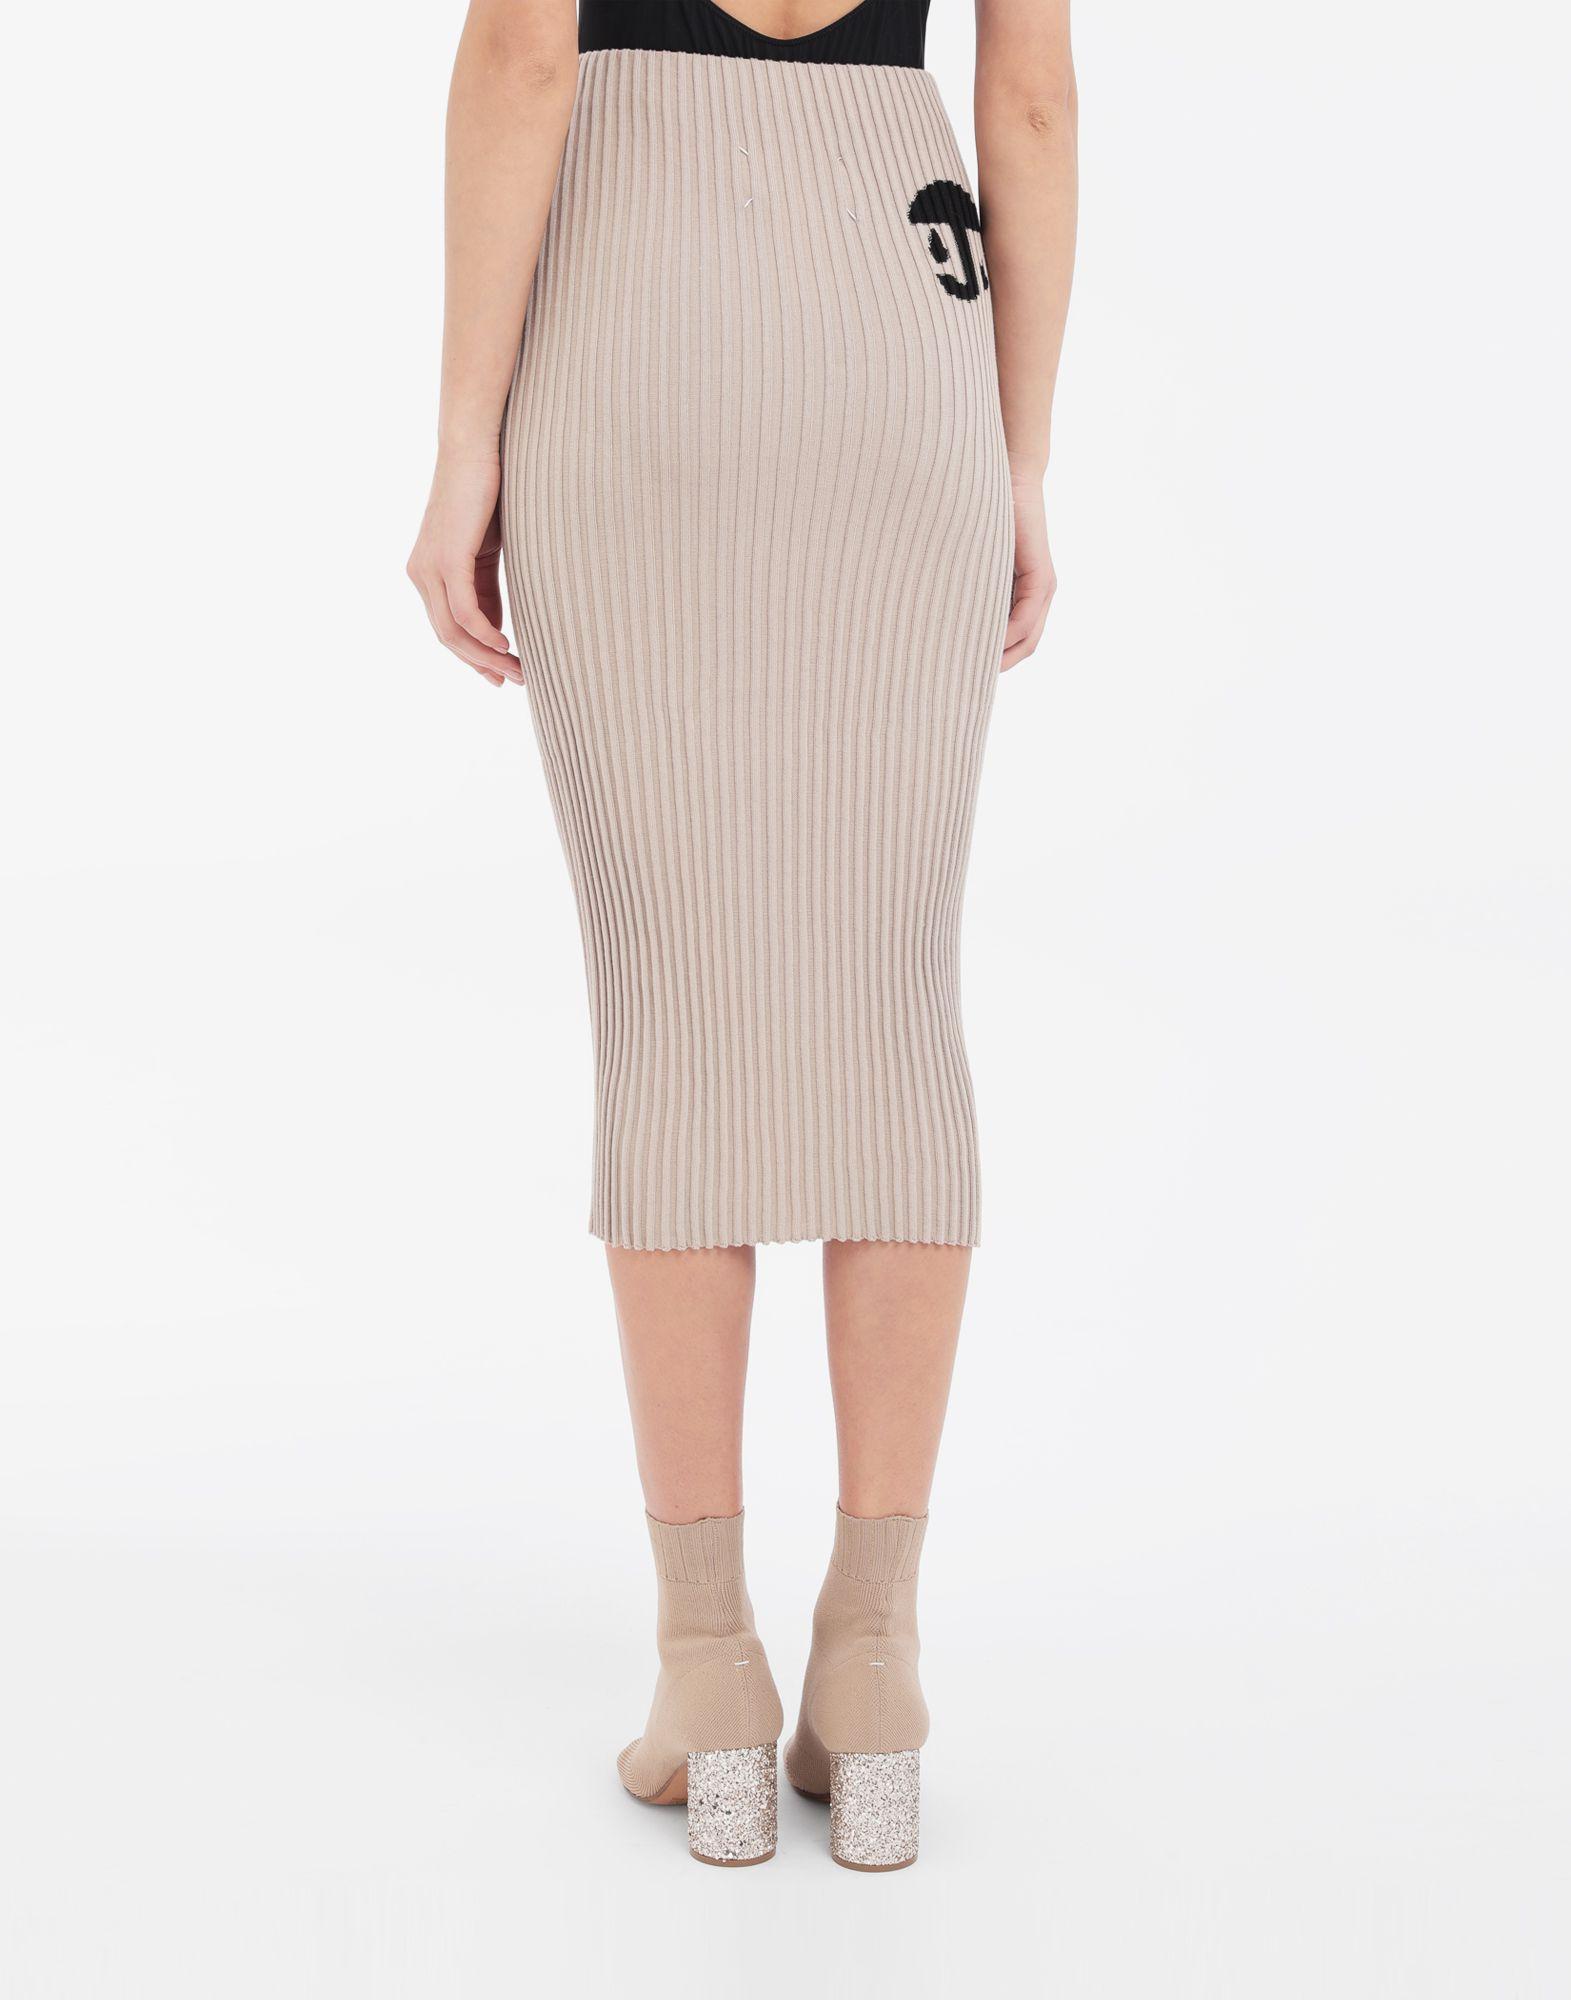 MAISON MARGIELA Knit ribs skirt in 'Carton' intarsia 3/4 length skirt Woman e